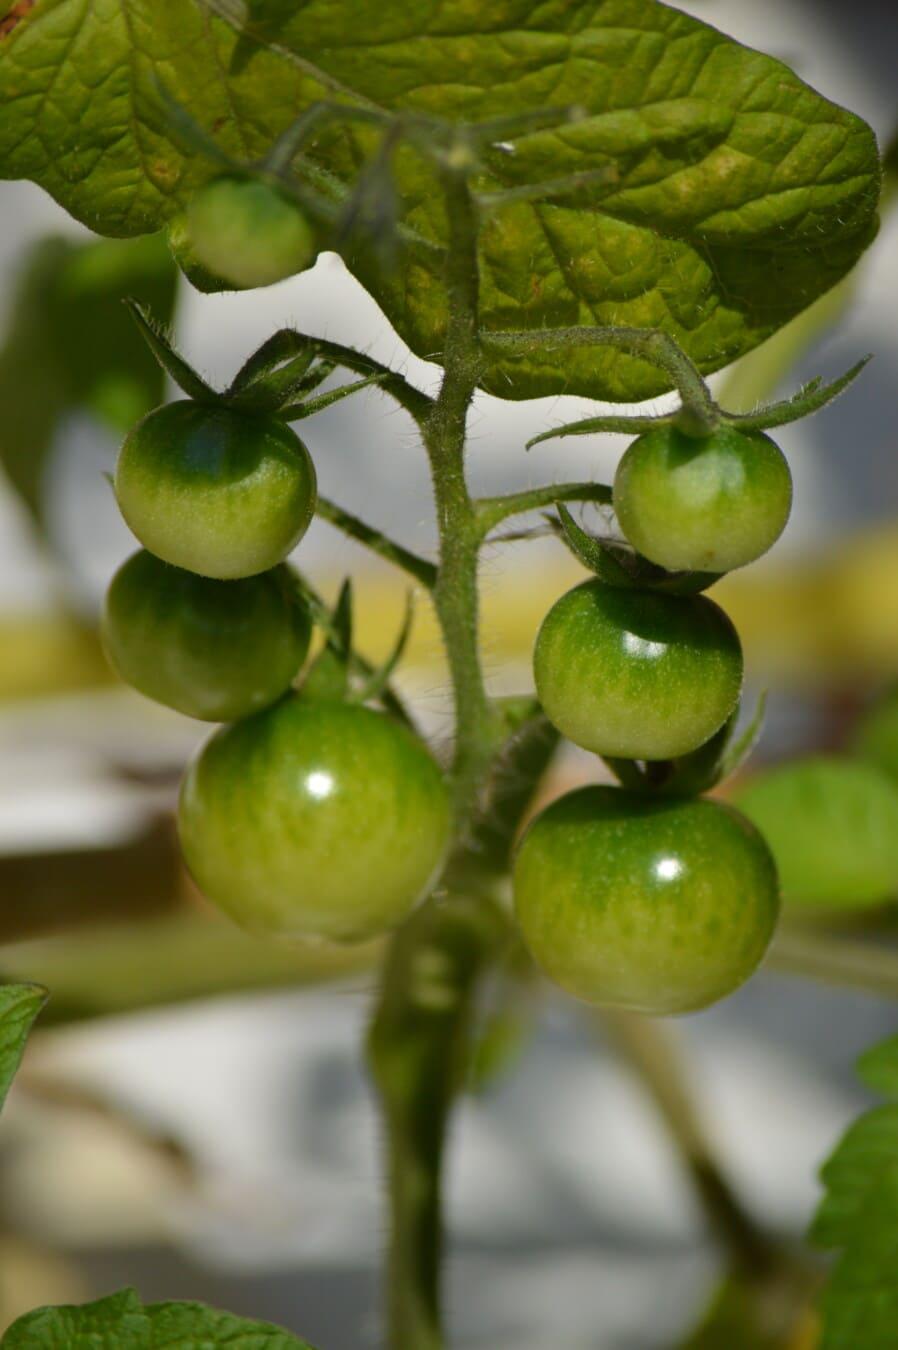 green, unripe, green leaf, tomatoes, miniature, tomato, small, organic, agriculture, nature